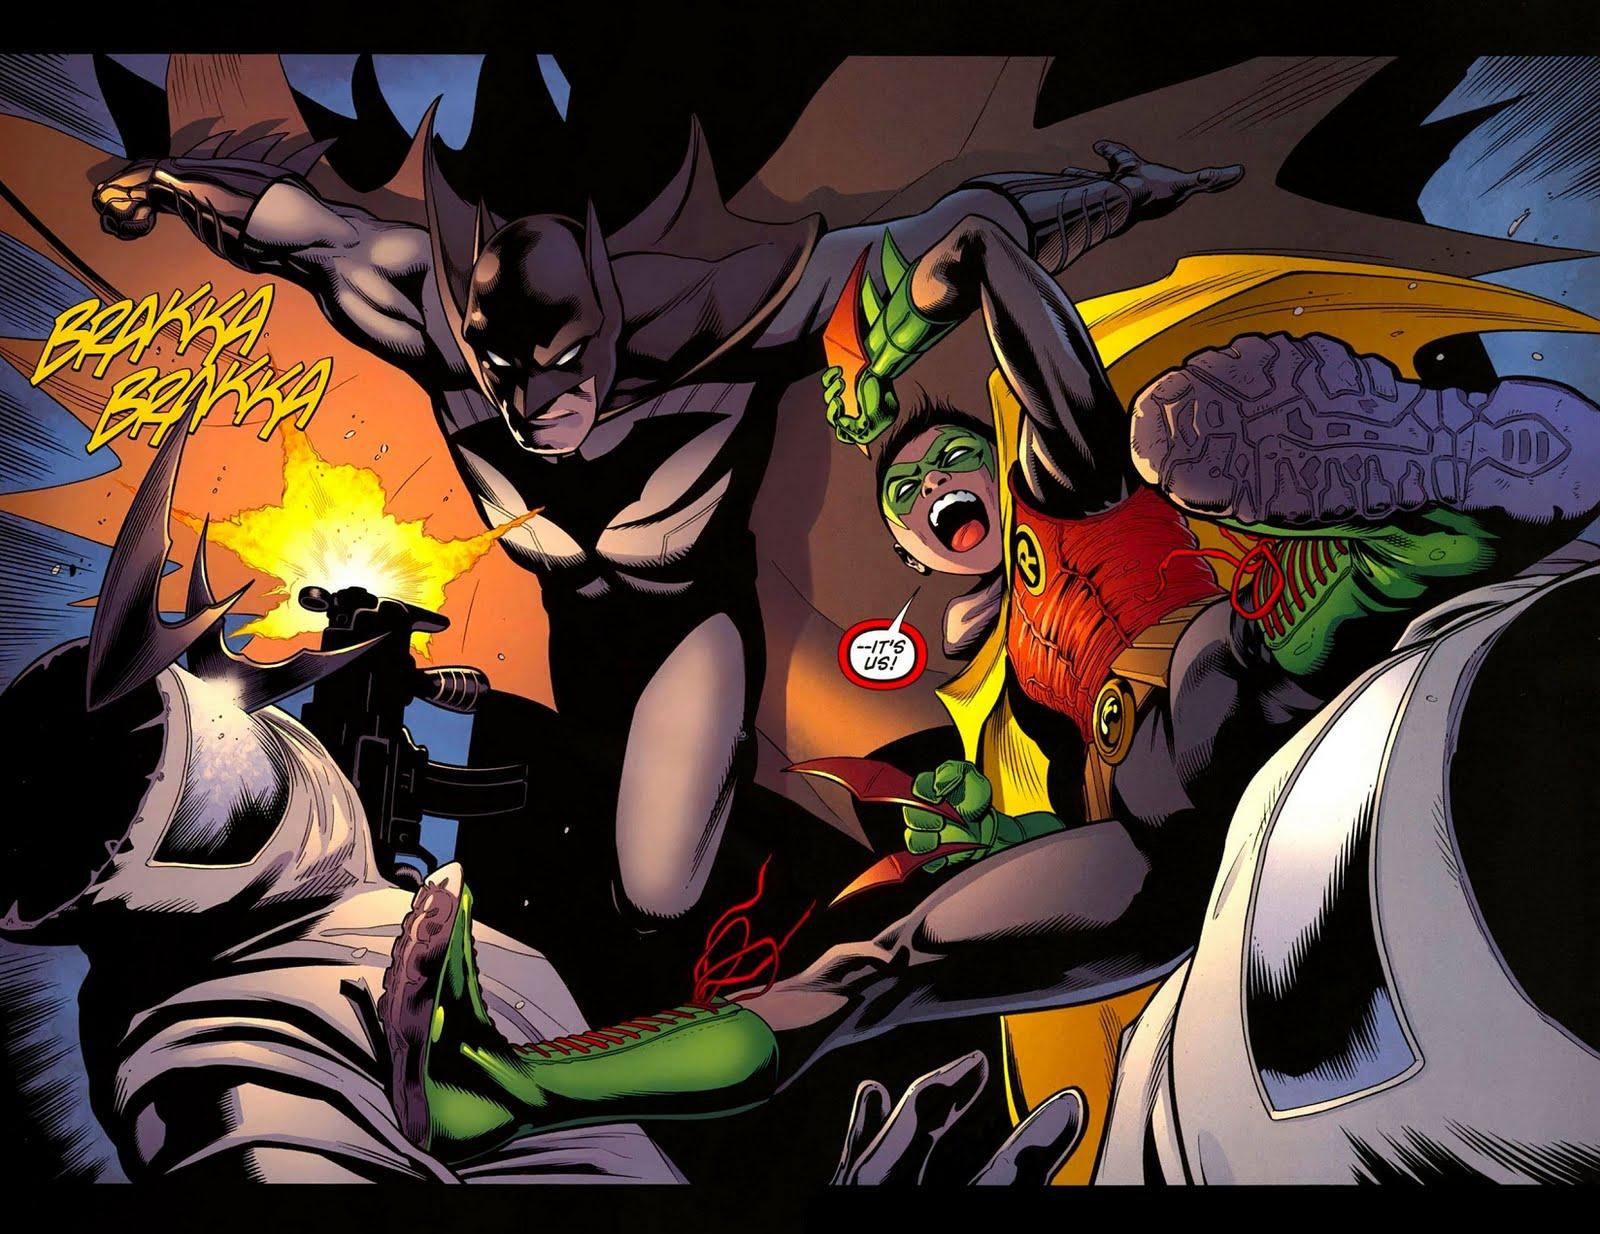 Batman et robin en librairie chez urban comics - Image de batman et robin ...